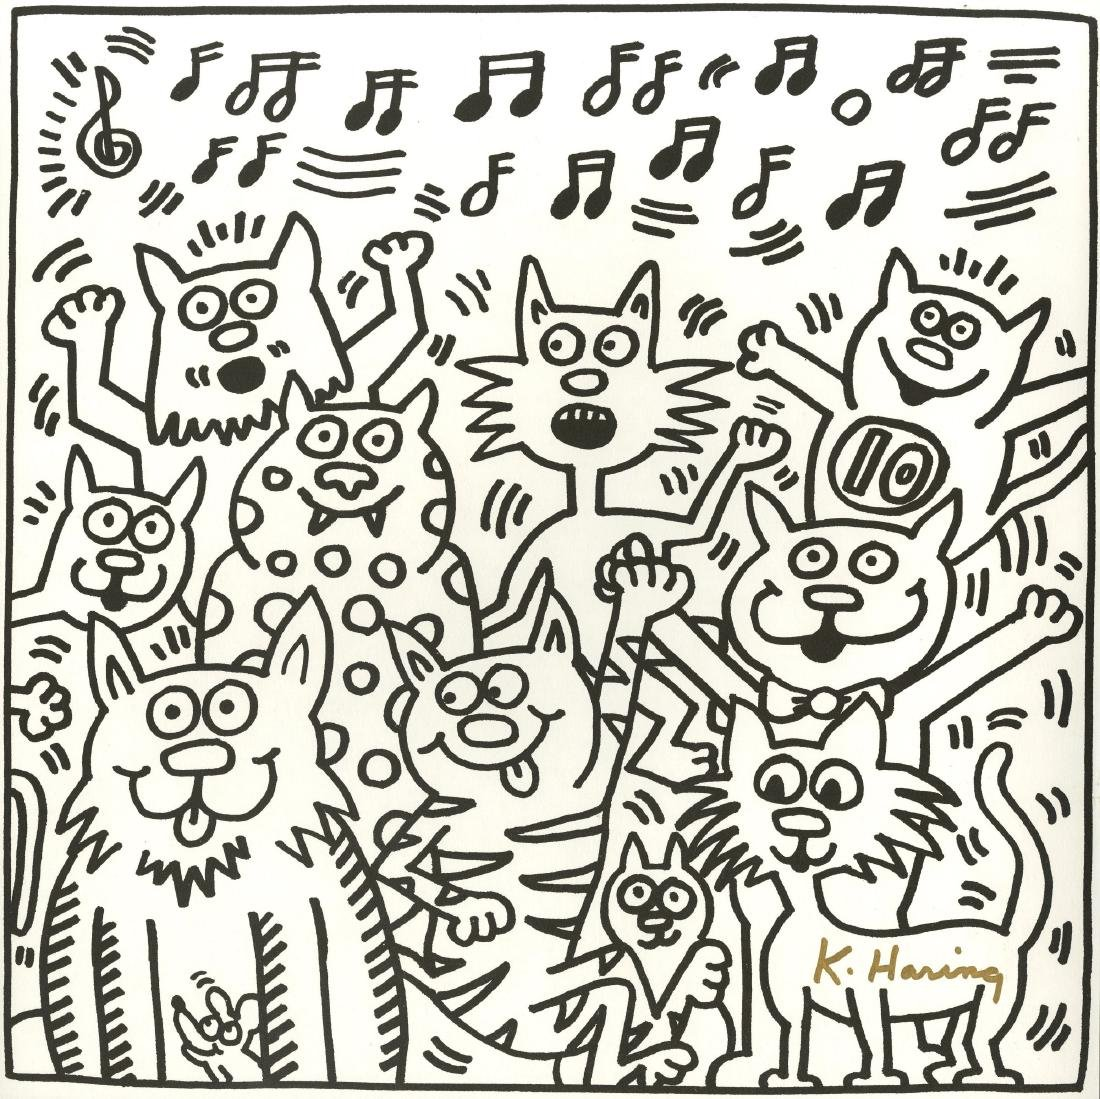 1902: KEITH HARING - Ten Cats